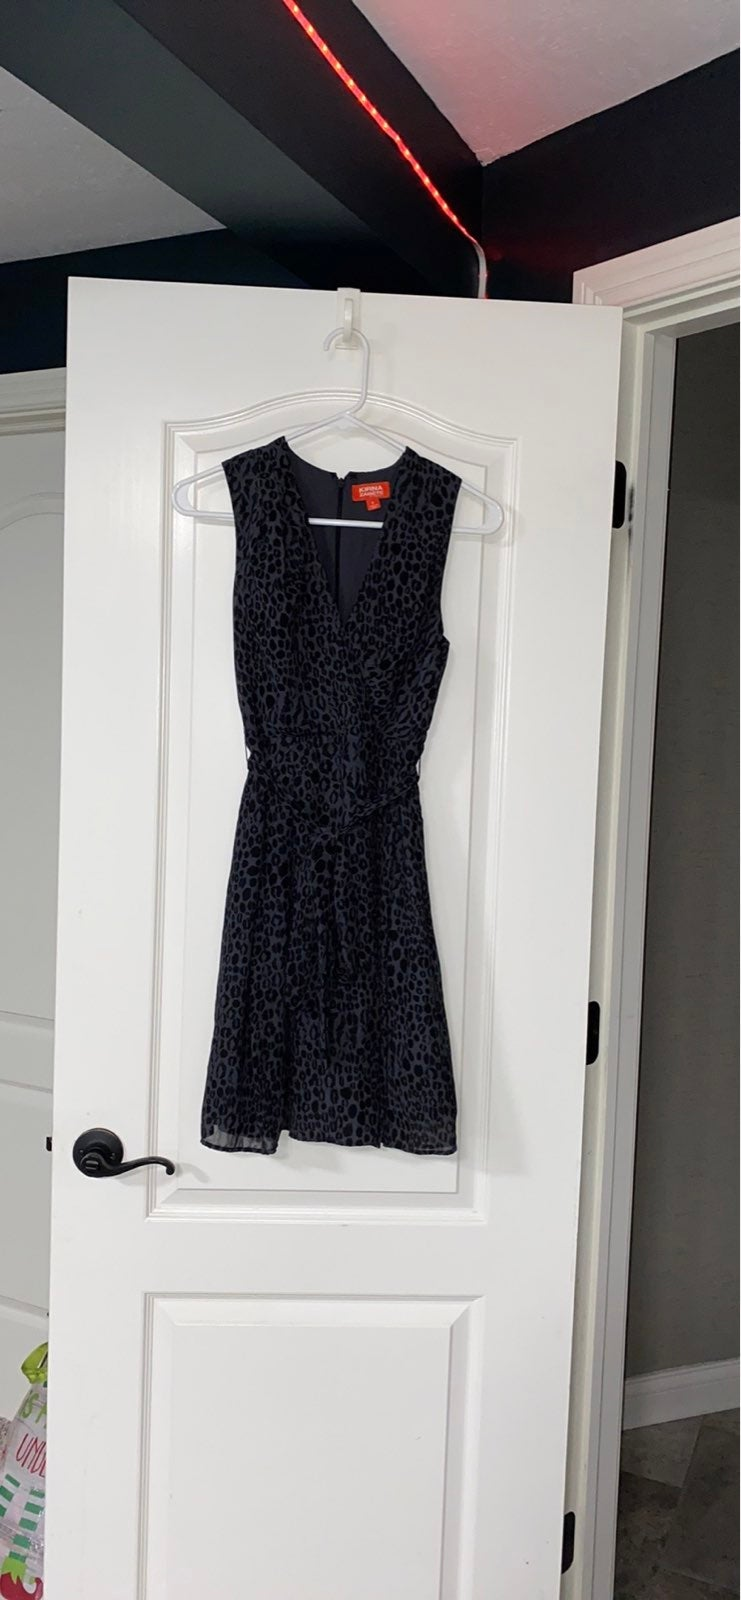 Women's Kirna Zabete Cheetah Dress